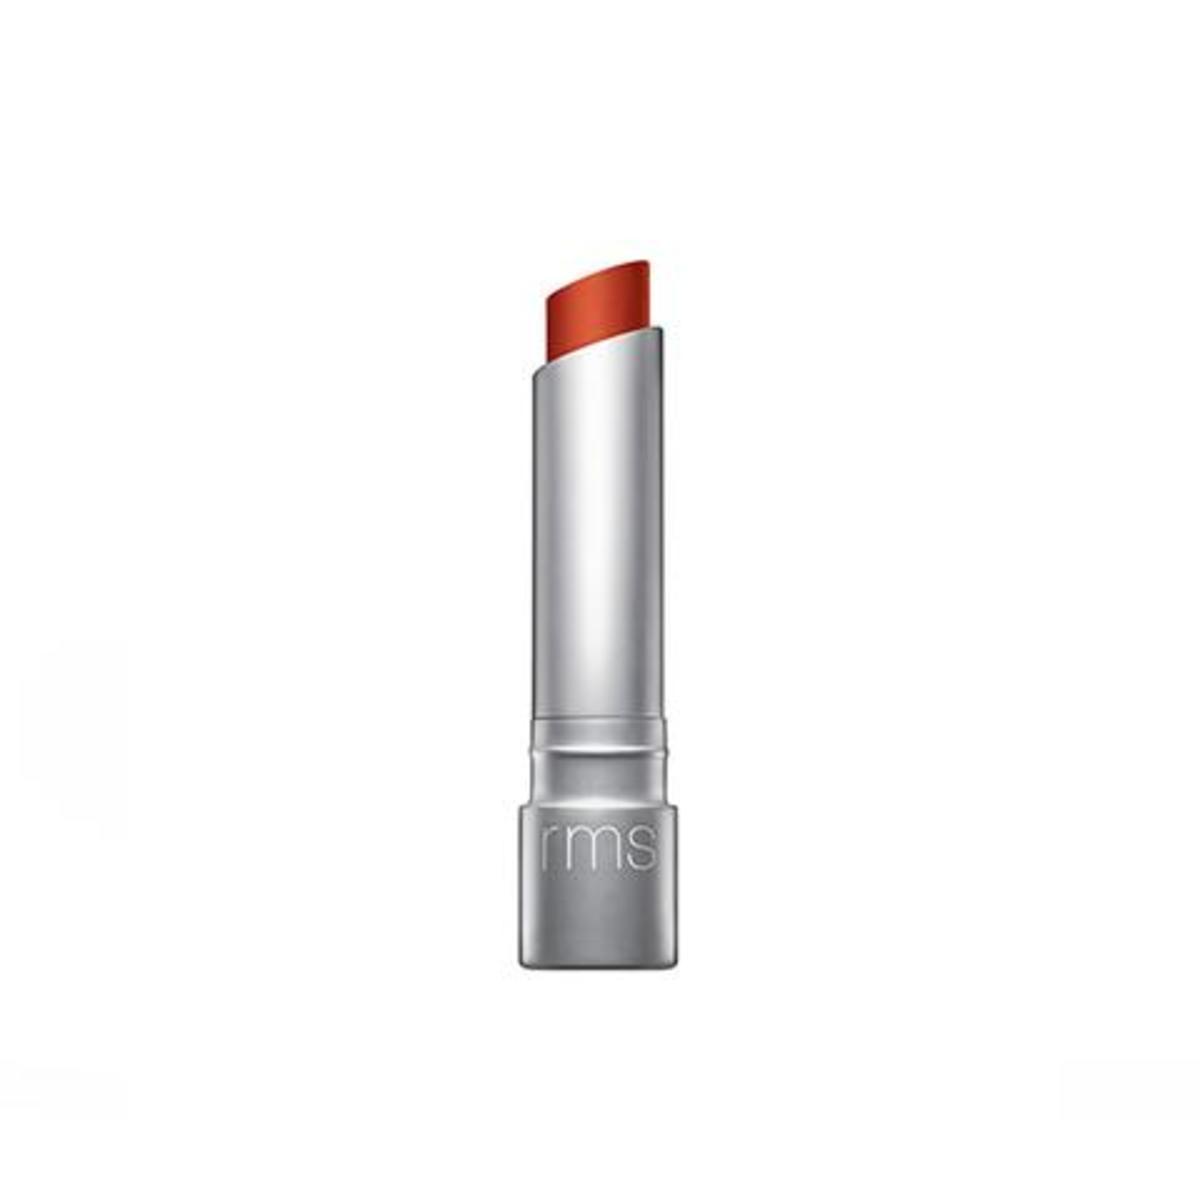 RMS Lipstick